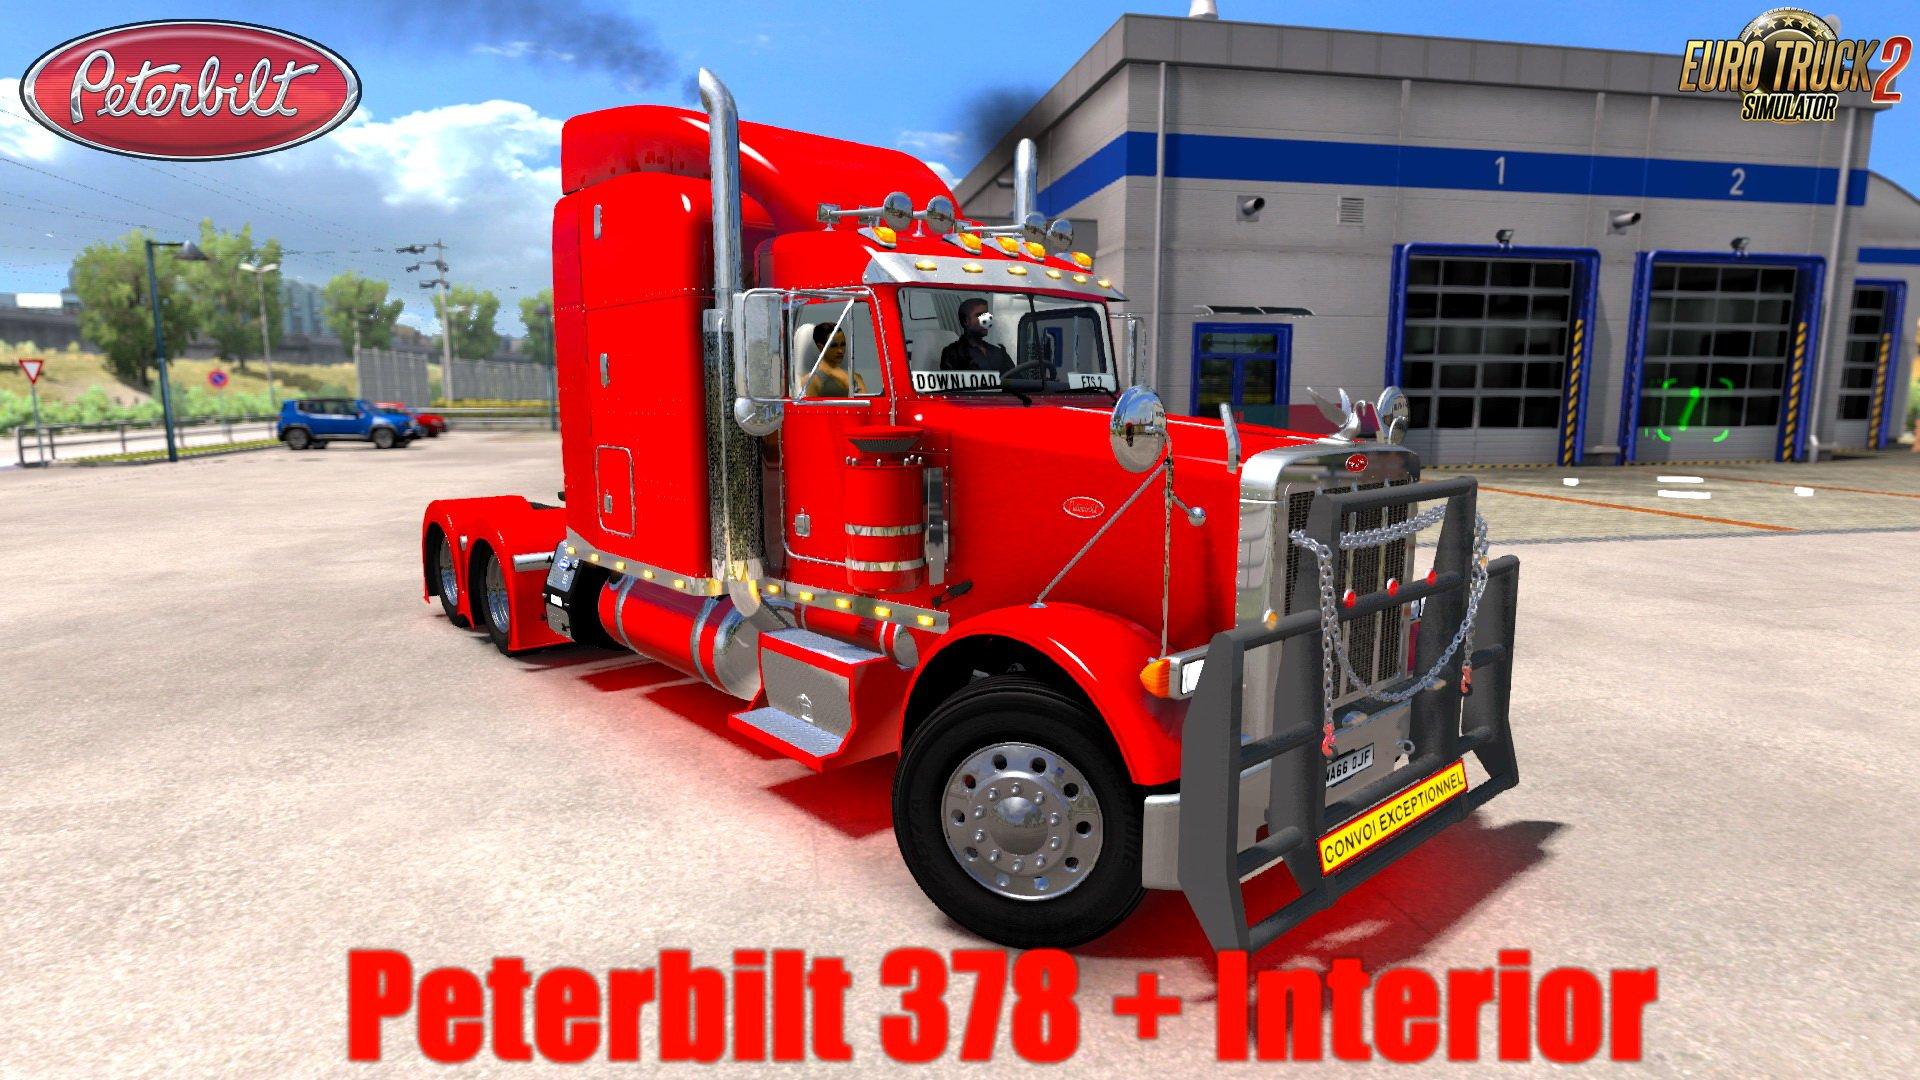 Peterbilt 378 + Interior v3.0 (1.30.x) (ETS 2)